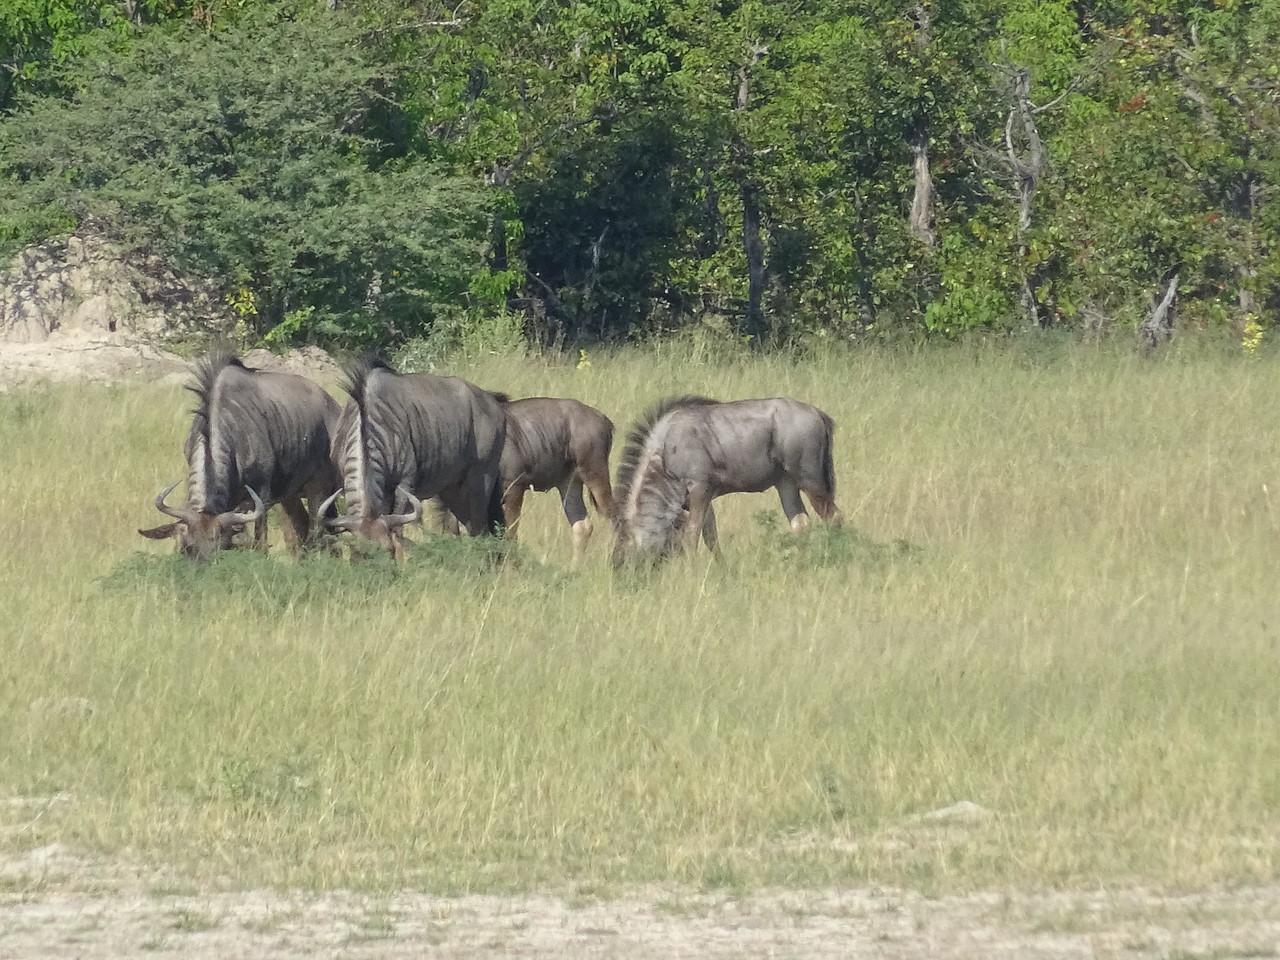 134_Okavango Delta, Moremi Game Reserve  4WD Safari  Blue Wildebeest